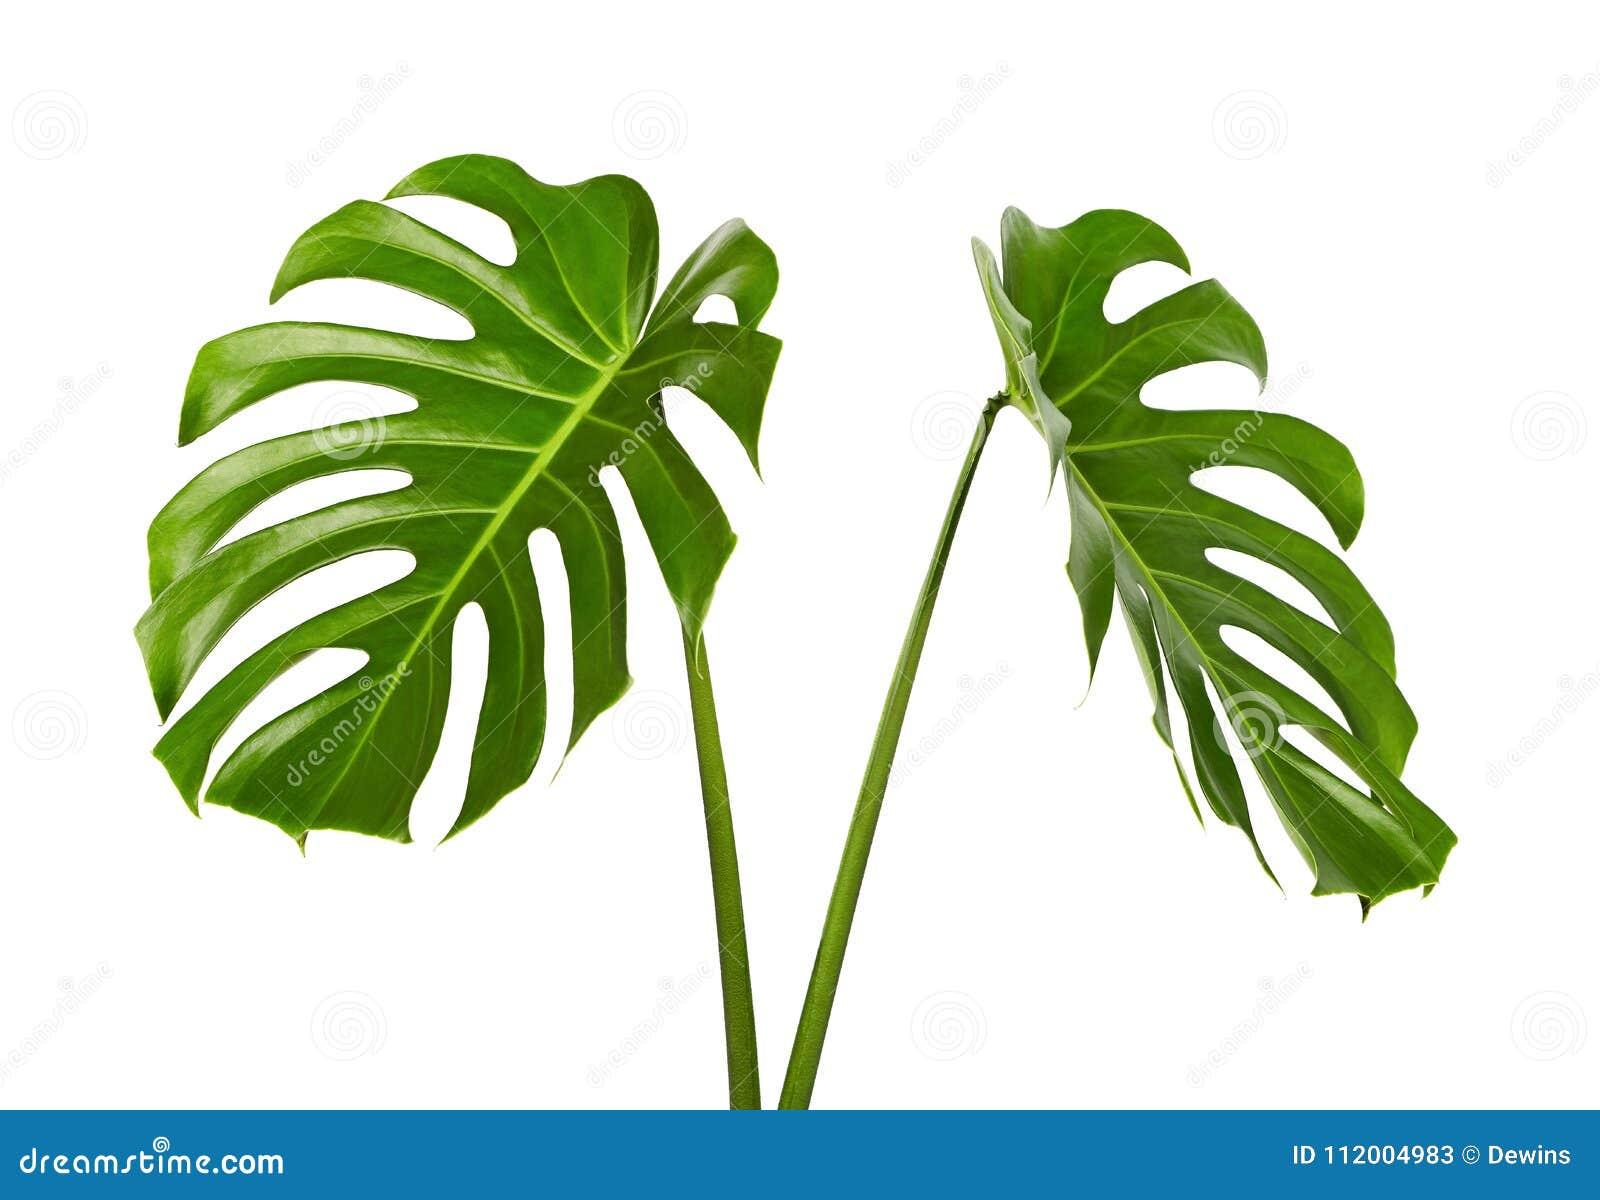 Folha do deliciosa de Monstera ou planta do queijo suíço, folha tropical isolada no fundo branco